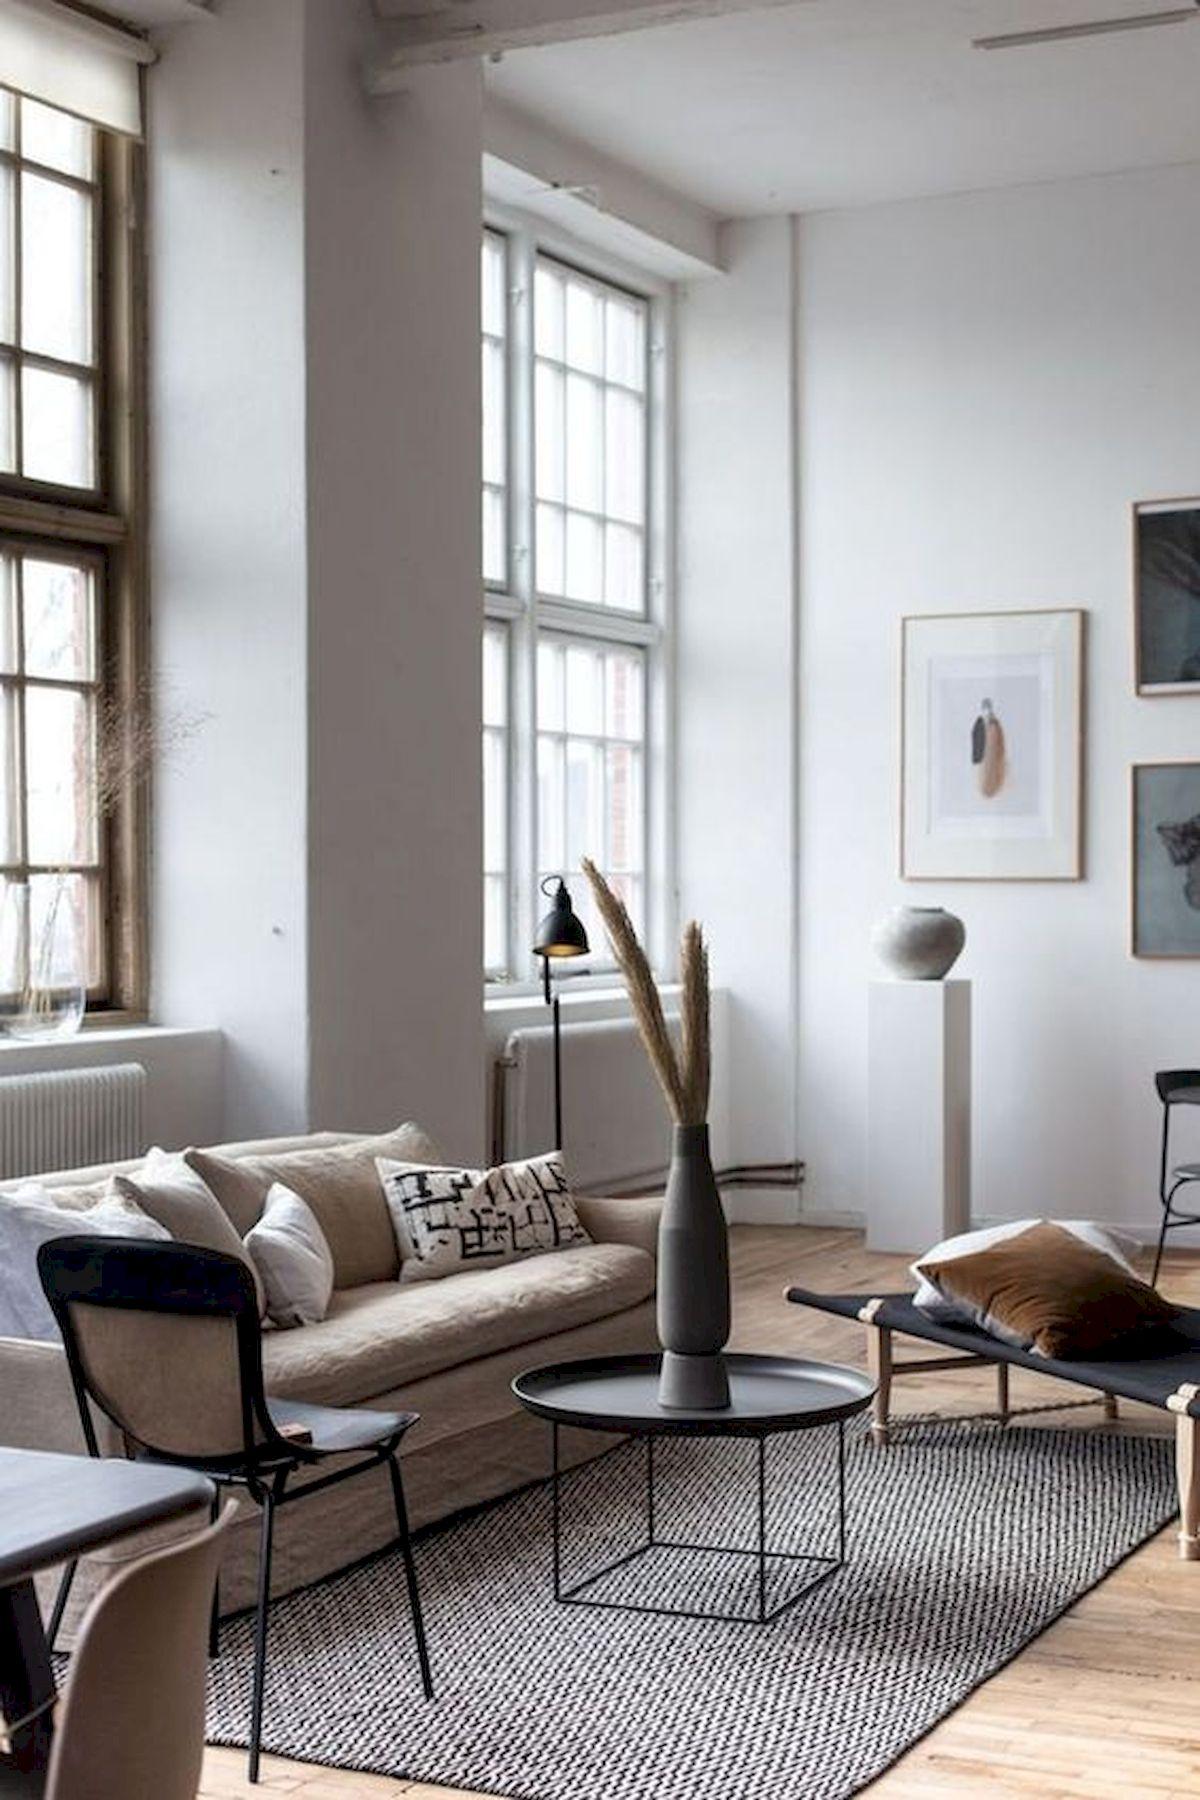 35 Stunning Scandinavian Interior Design and Decor Ideas (7)